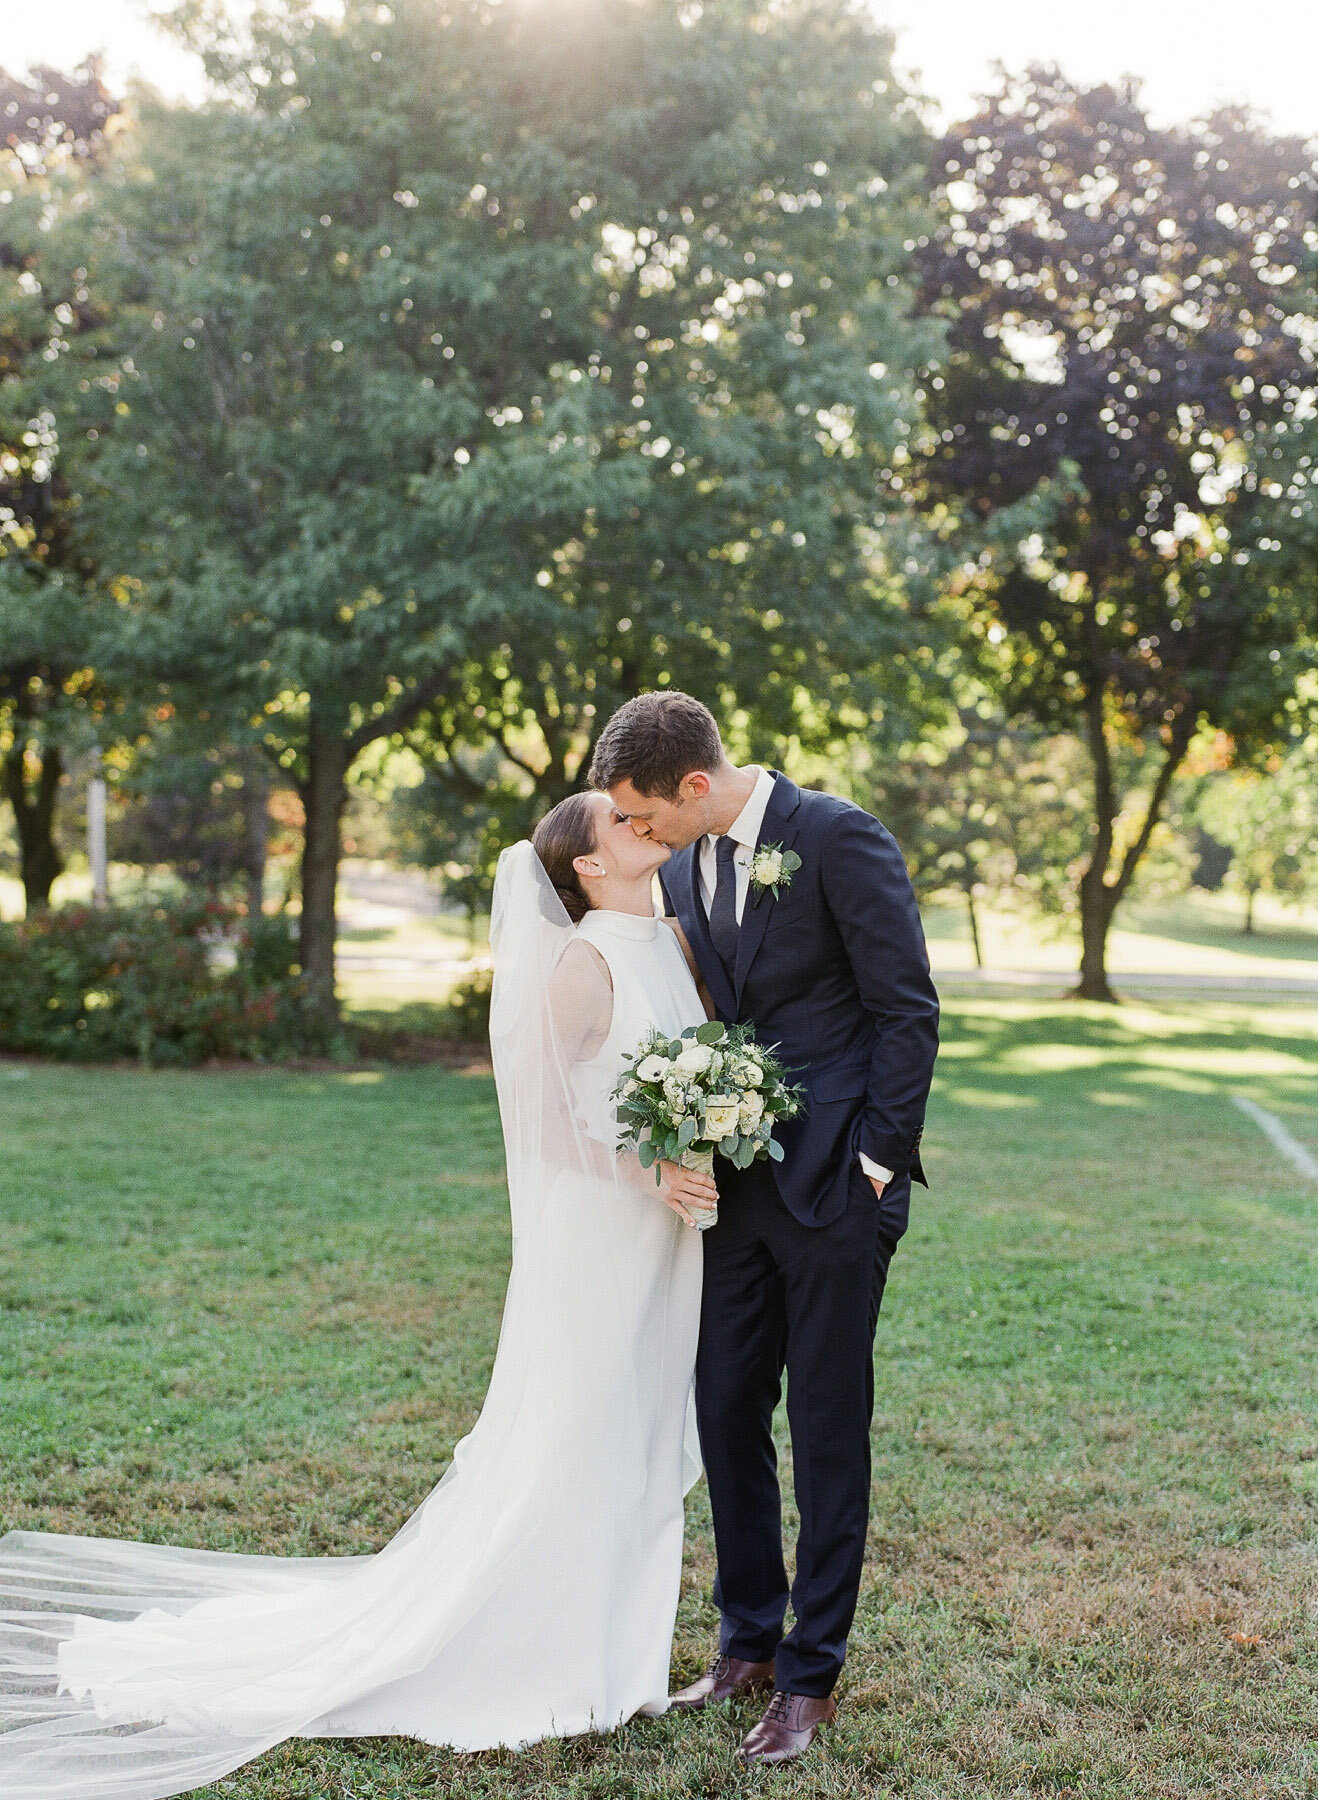 Adelphi Saratoga Wedding by Michelle Lange Photography-26.jpg